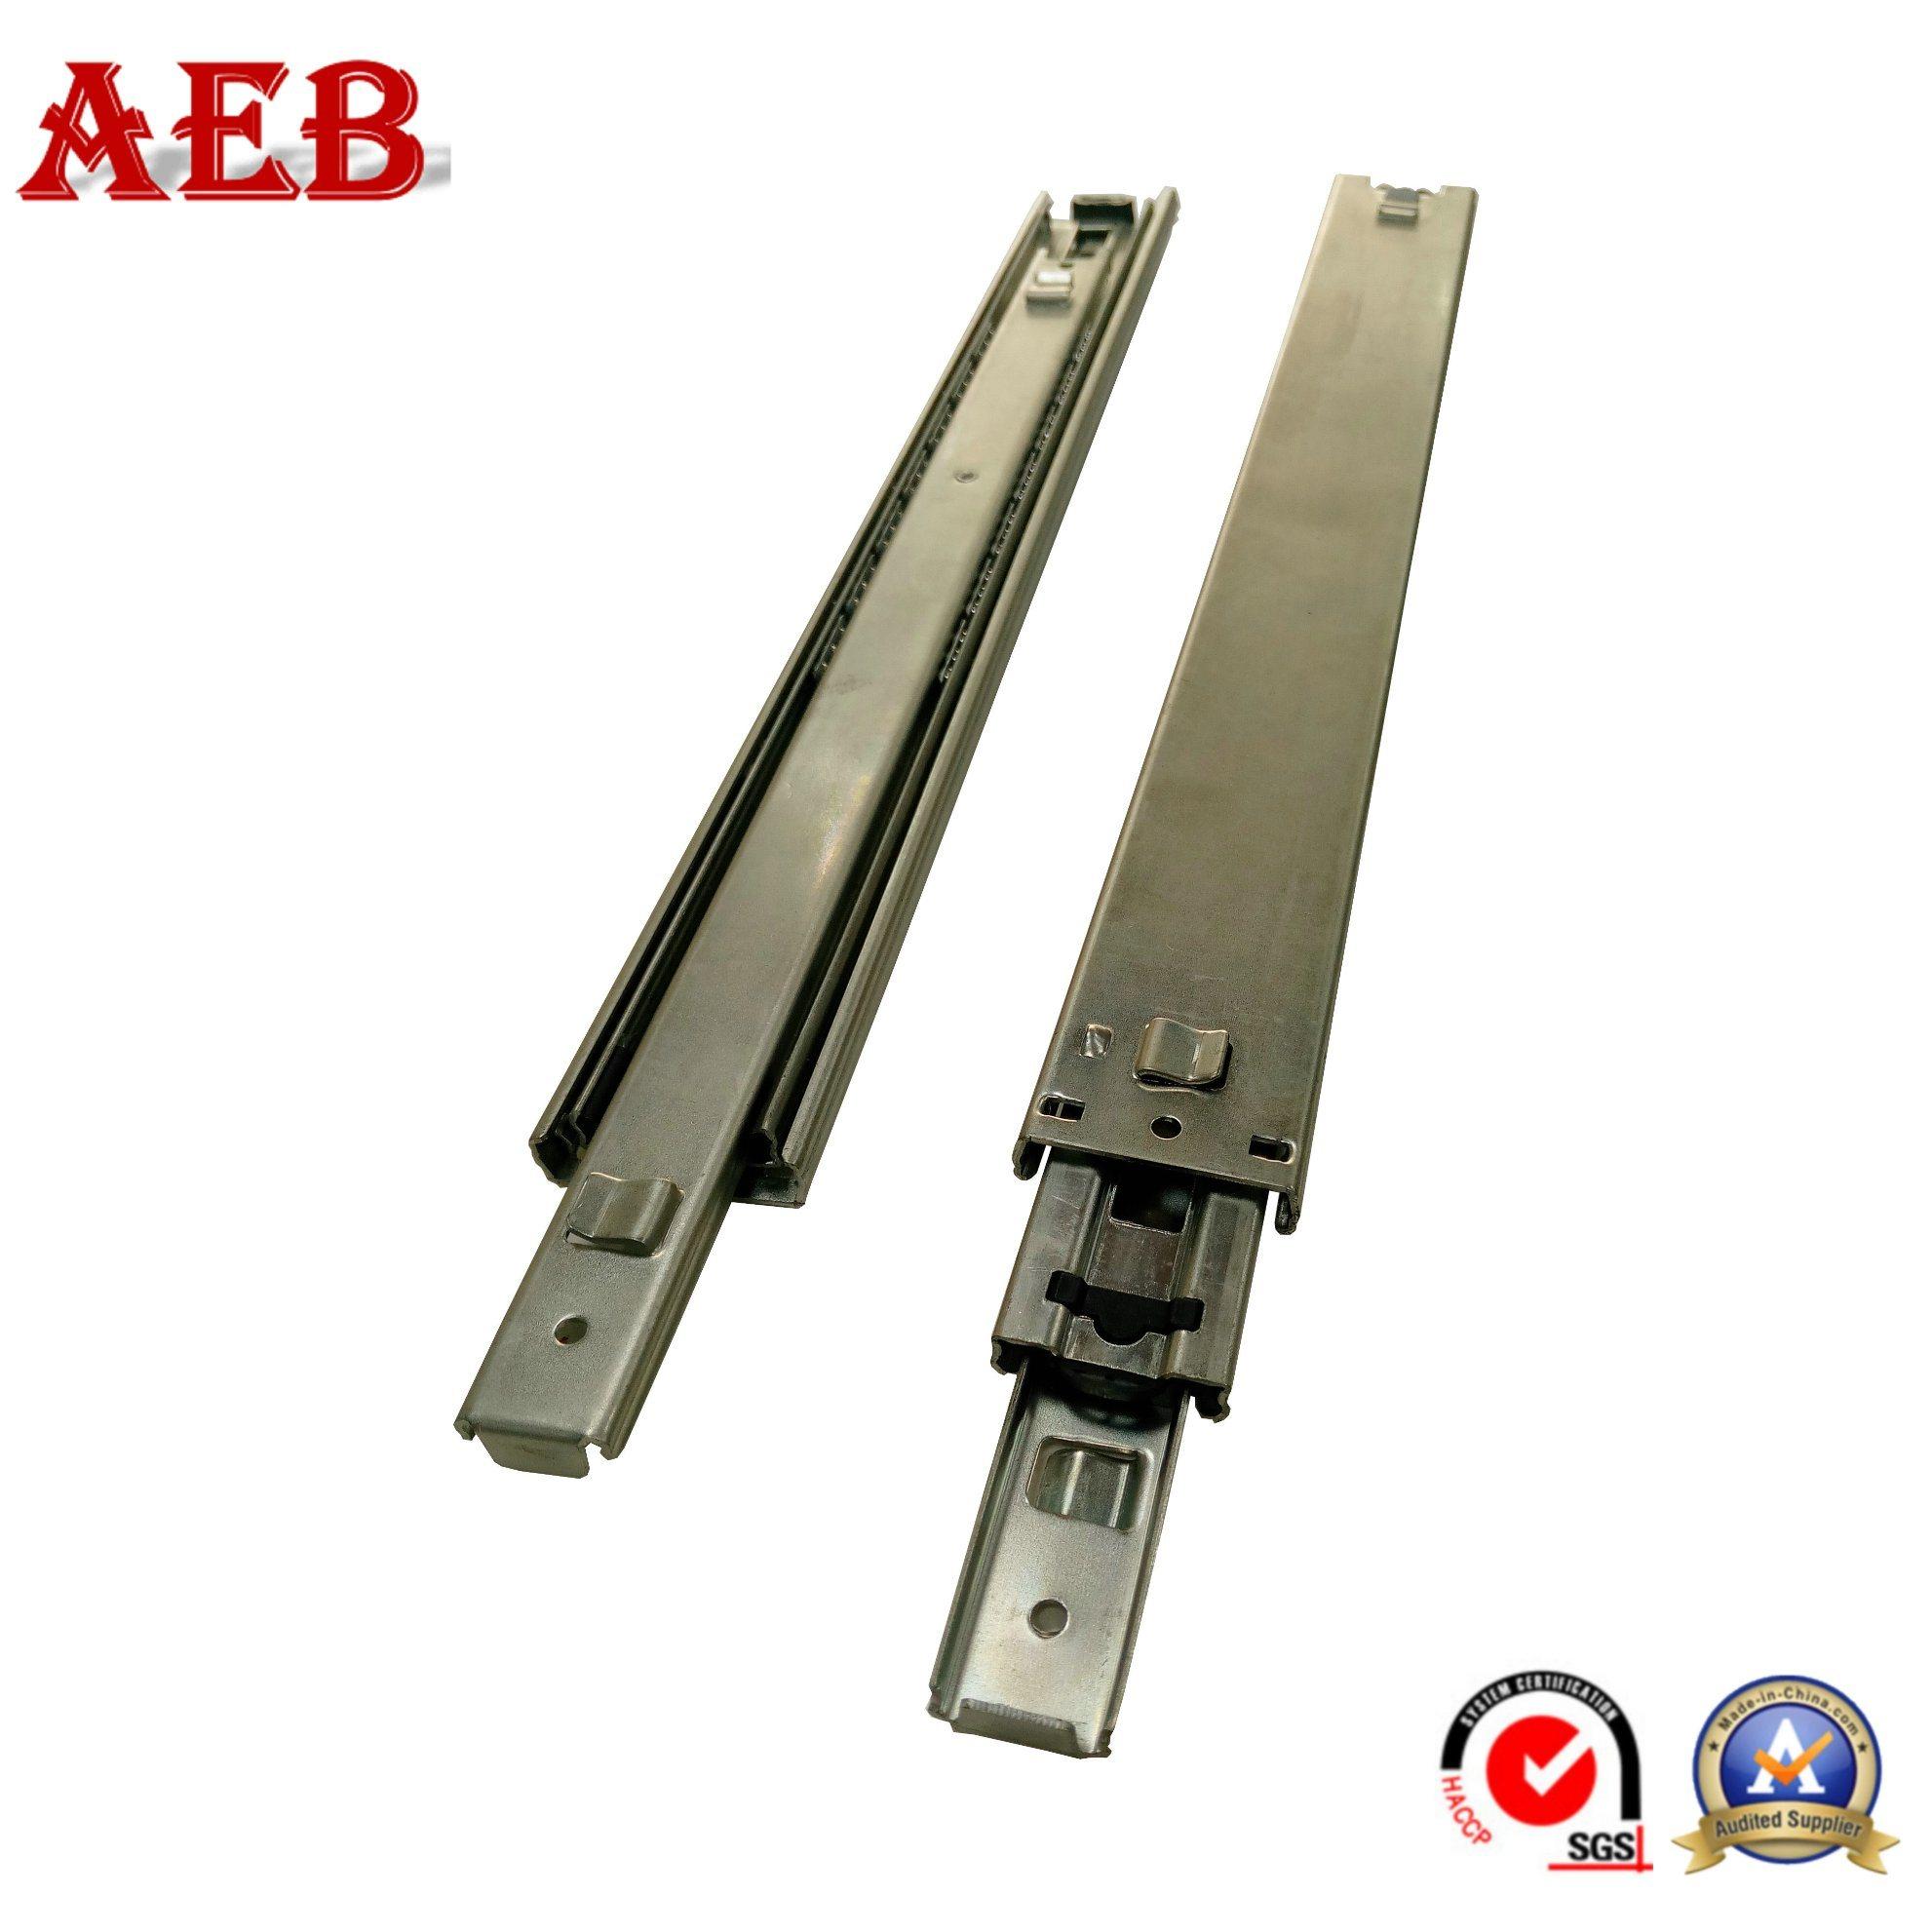 bearing wsanubhoaukj dtc galvanized drawer slides drawers cabinet rails high sliding ball extension with china product quality hardware sheet single